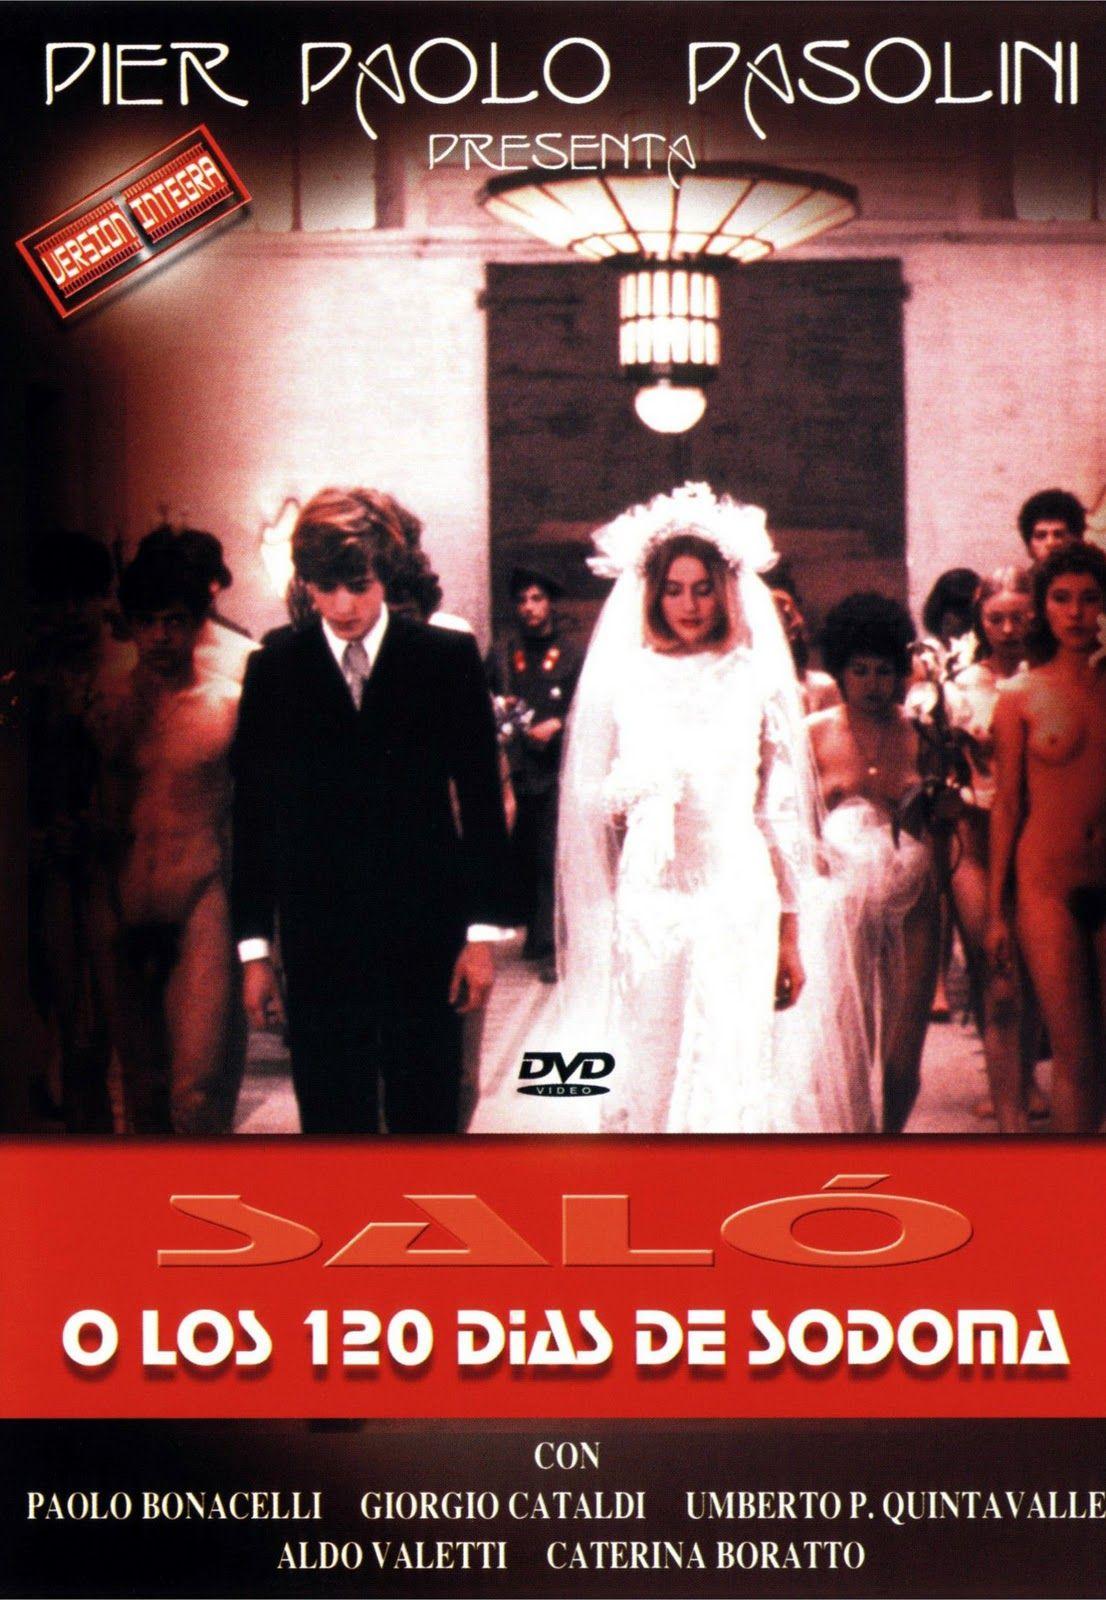 Pier Paolo Pasolini Salo O 120 Dias De Sodoma Movie Posters Movies Poster